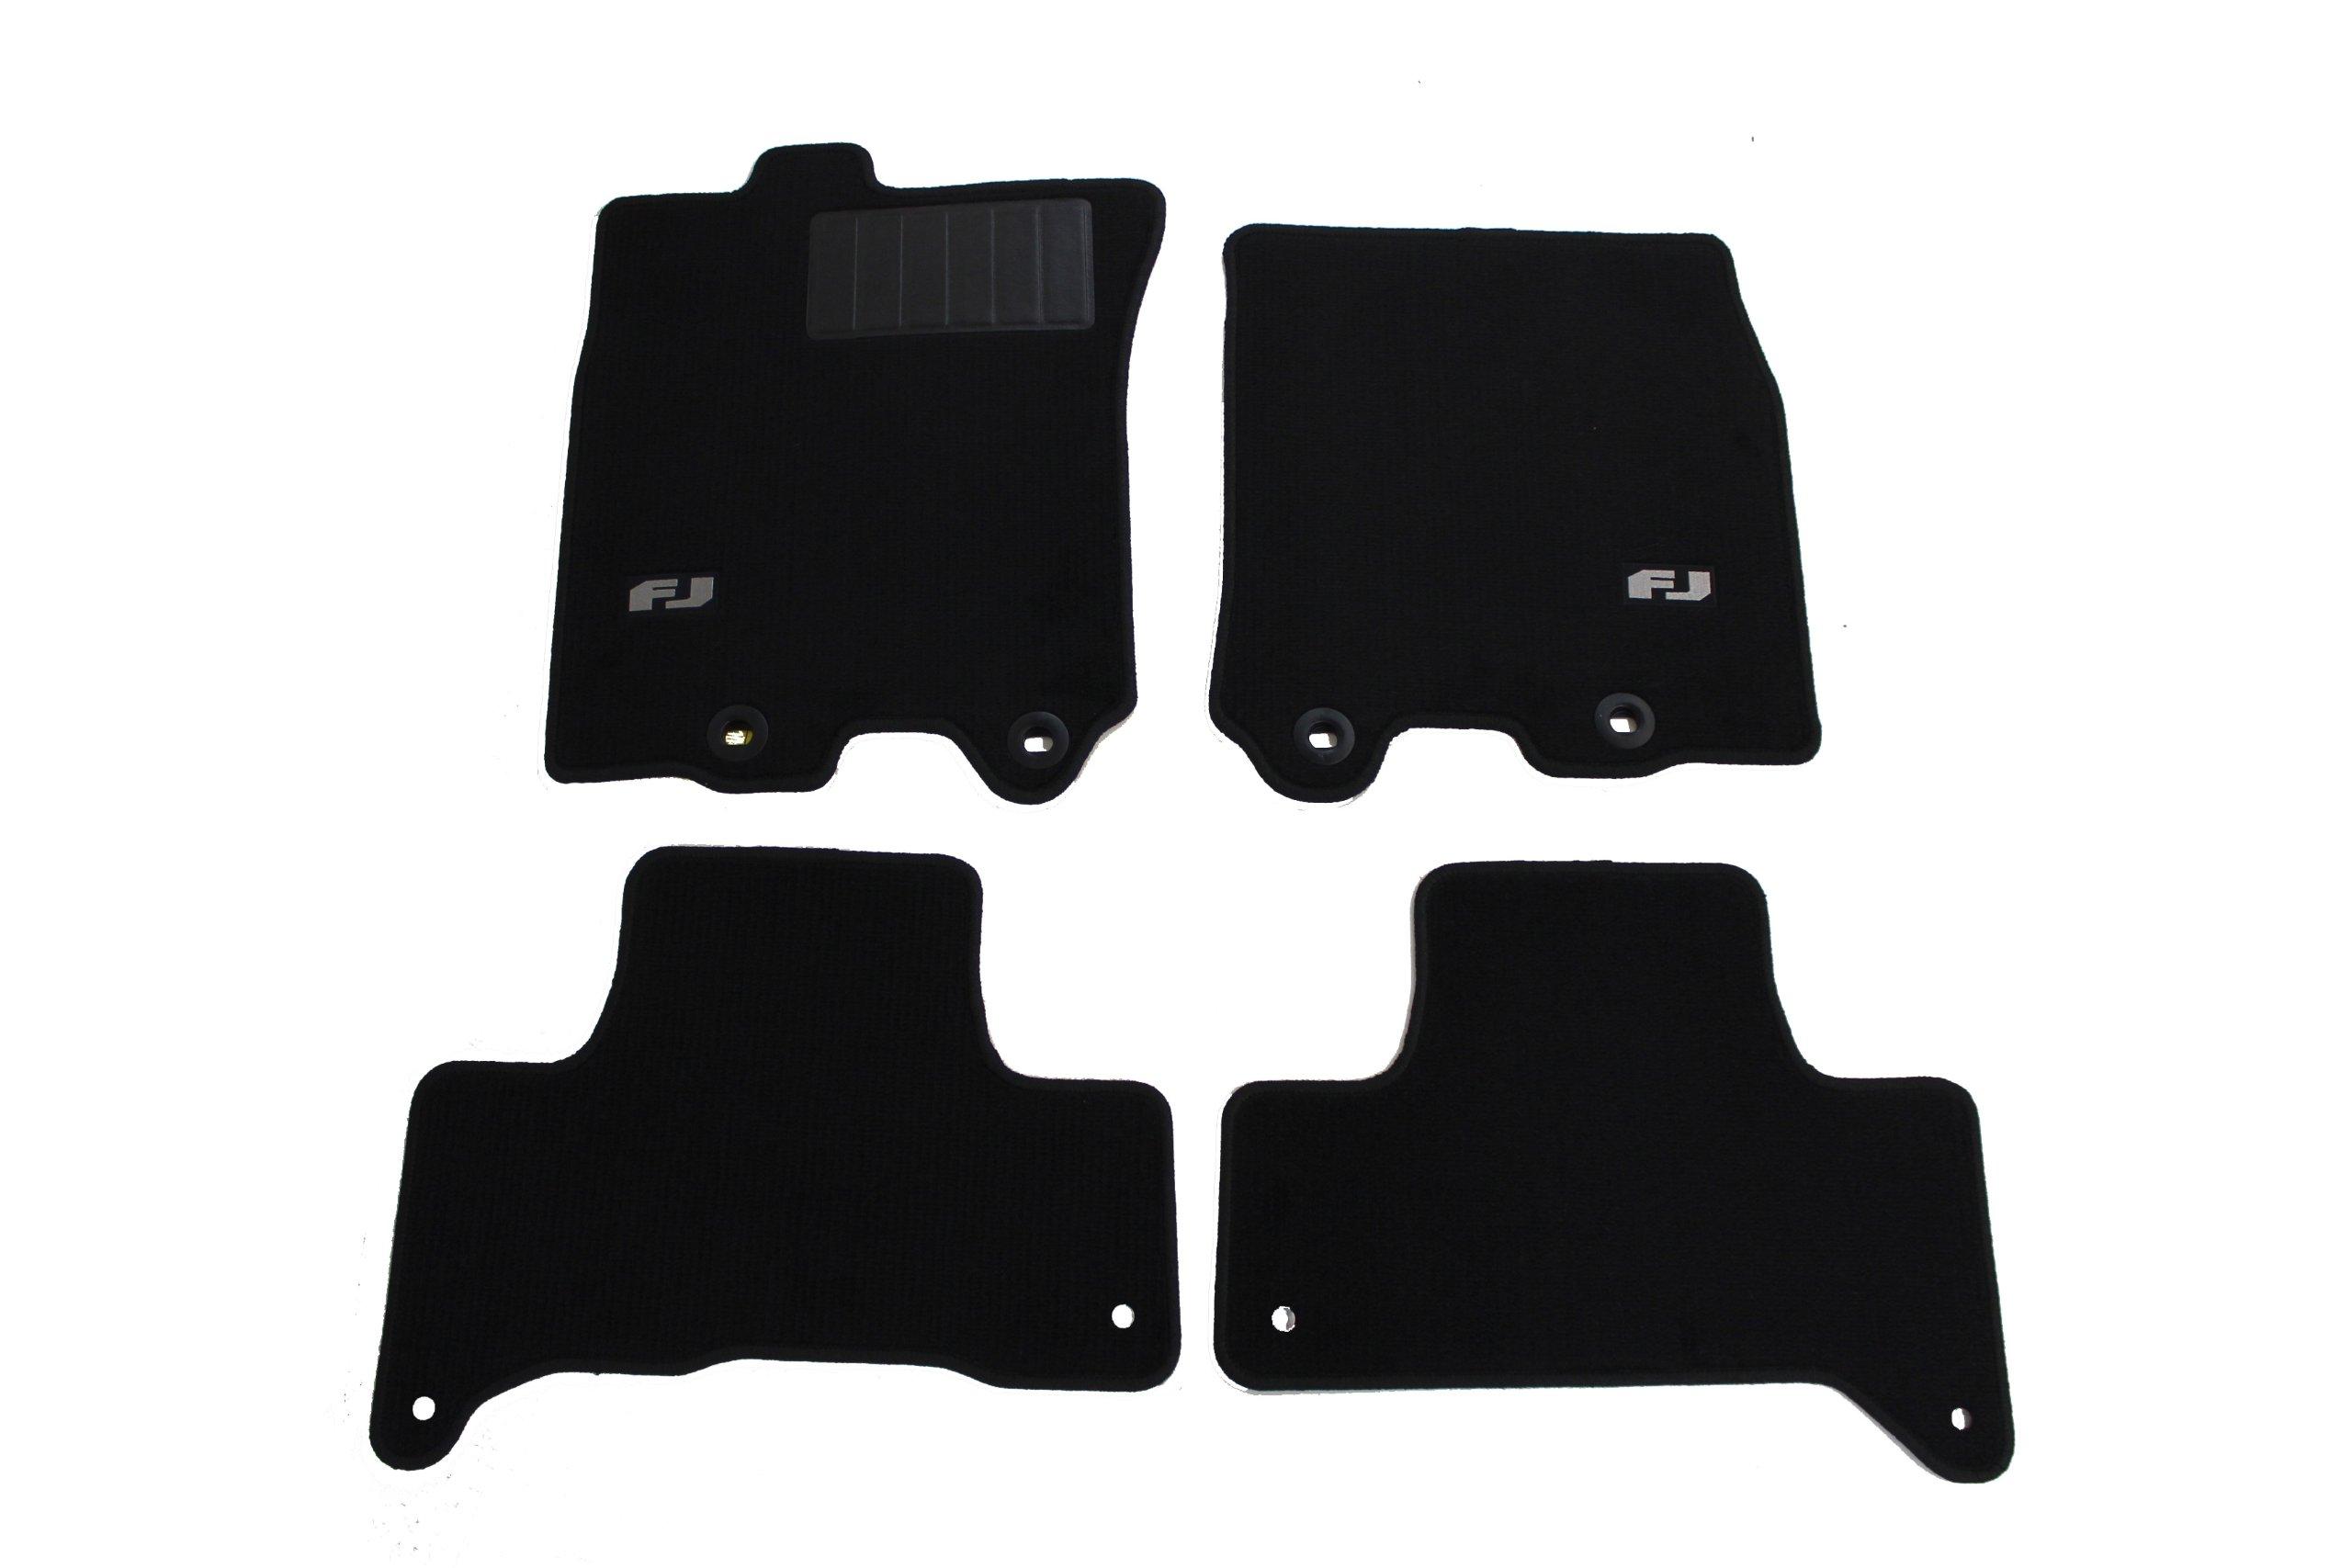 TOYOTA Genuine Accessories PT206-35110-20 Carpet Floor Mat for Select FJ Cruiser Models, Charcoal